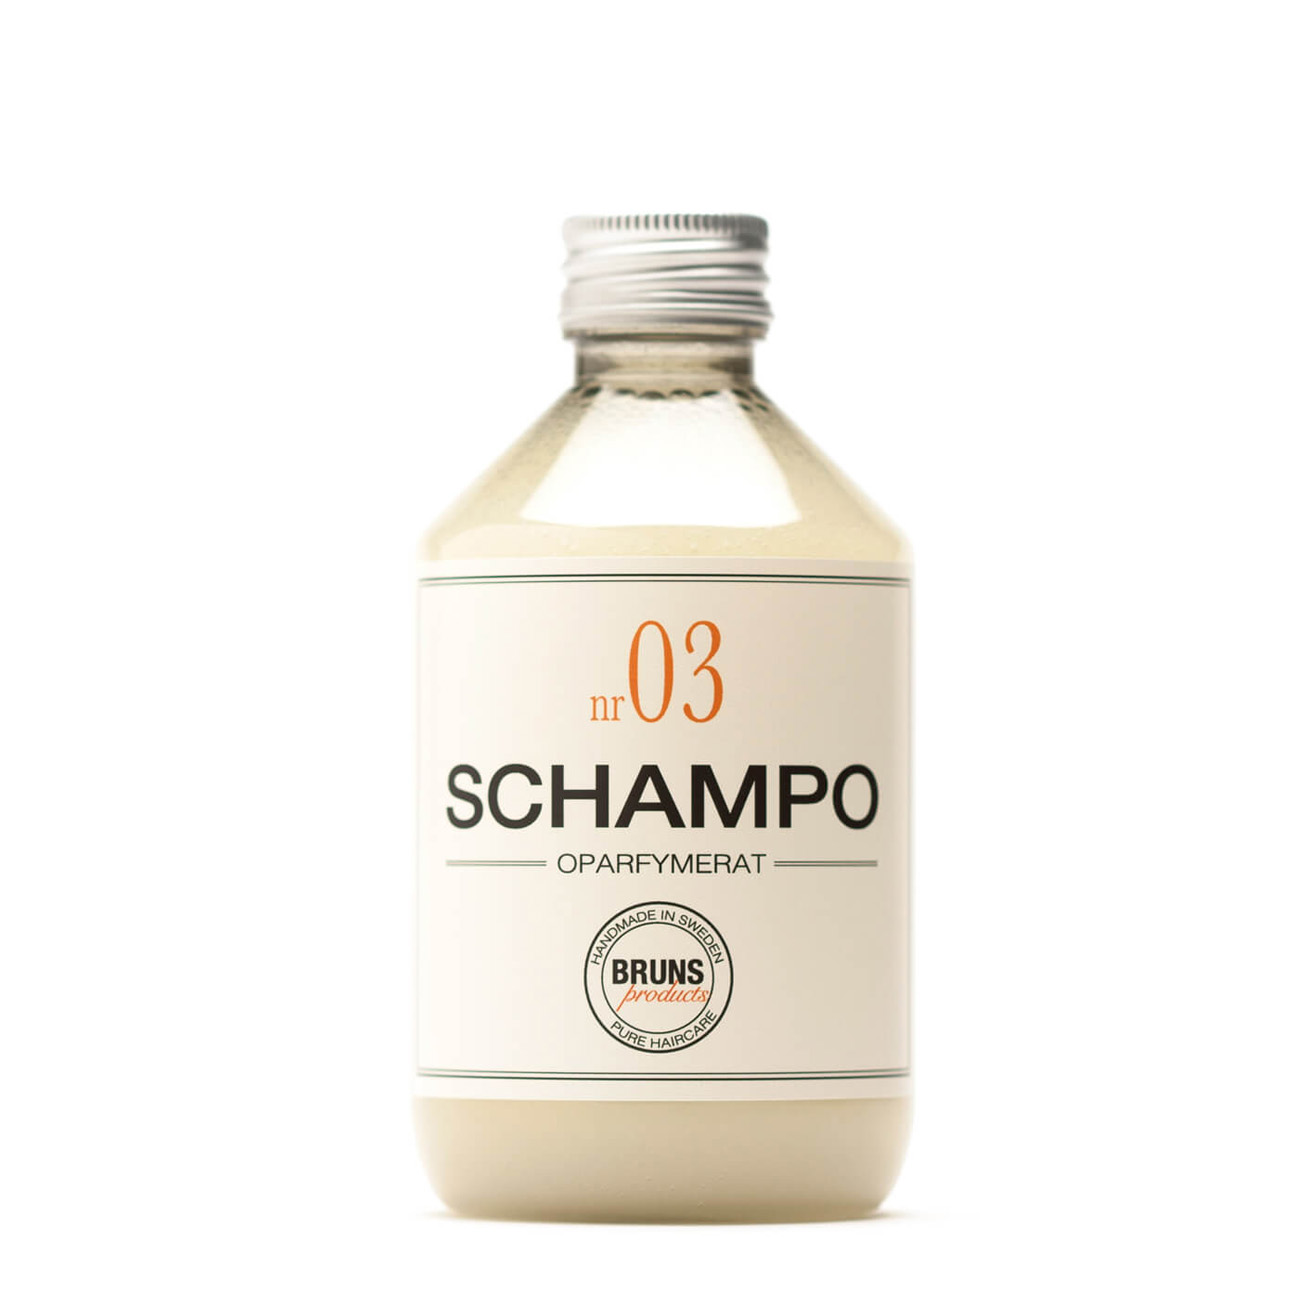 Champú Nº3 Sin Perfume 330ml - Embarazo, familia, alergias